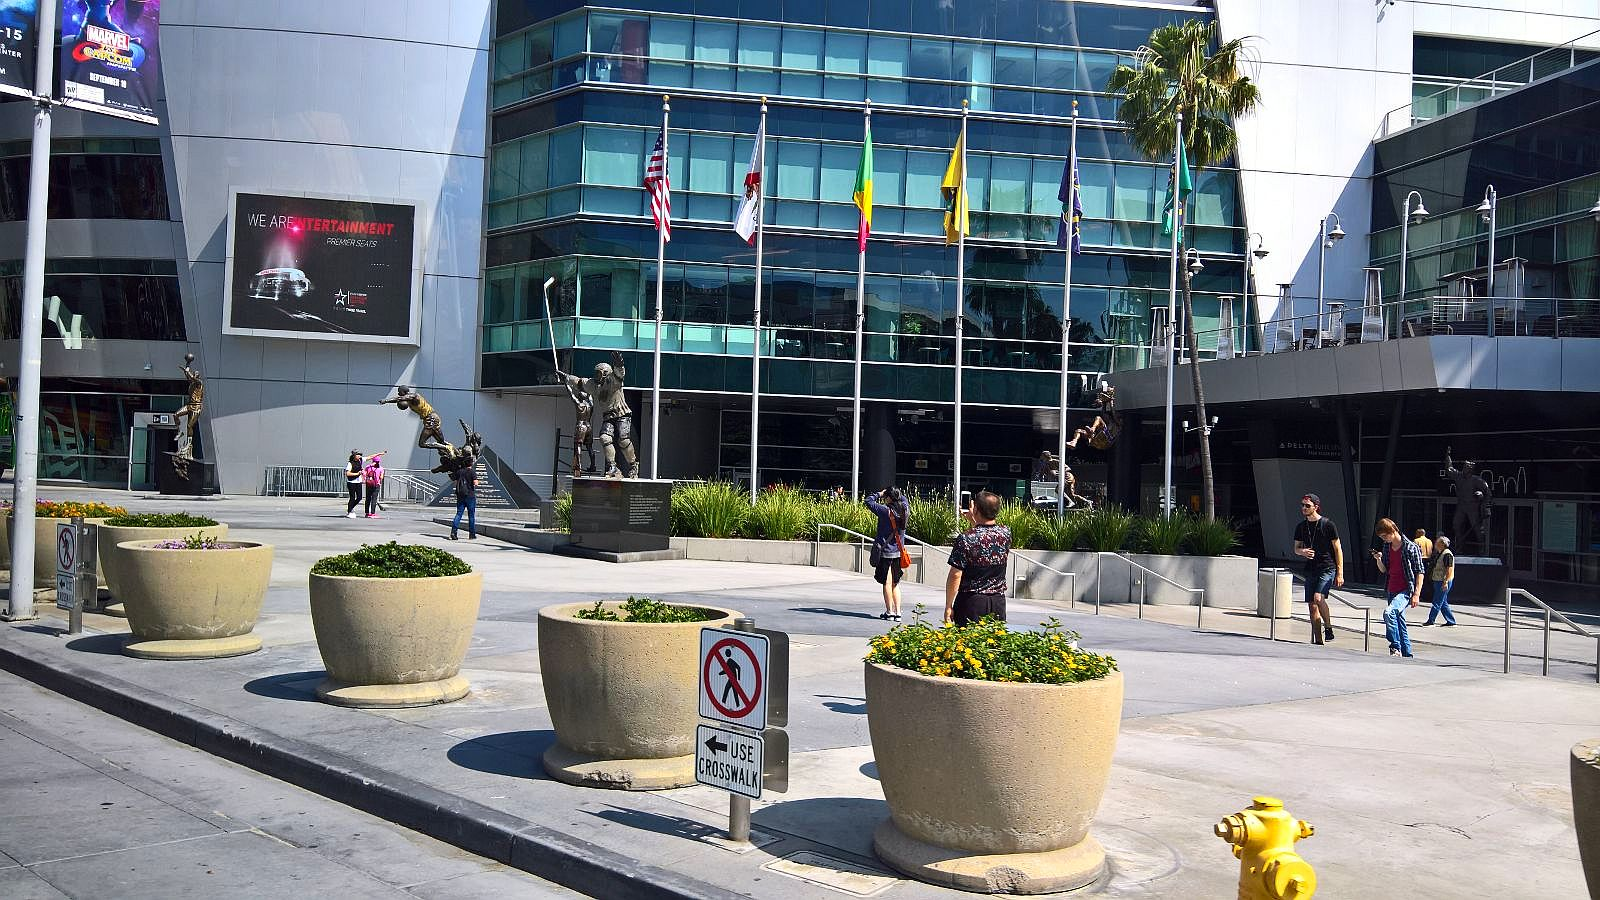 Los Angeles urheilu sport jäähalli stadion Mallaspulla matkakertomus